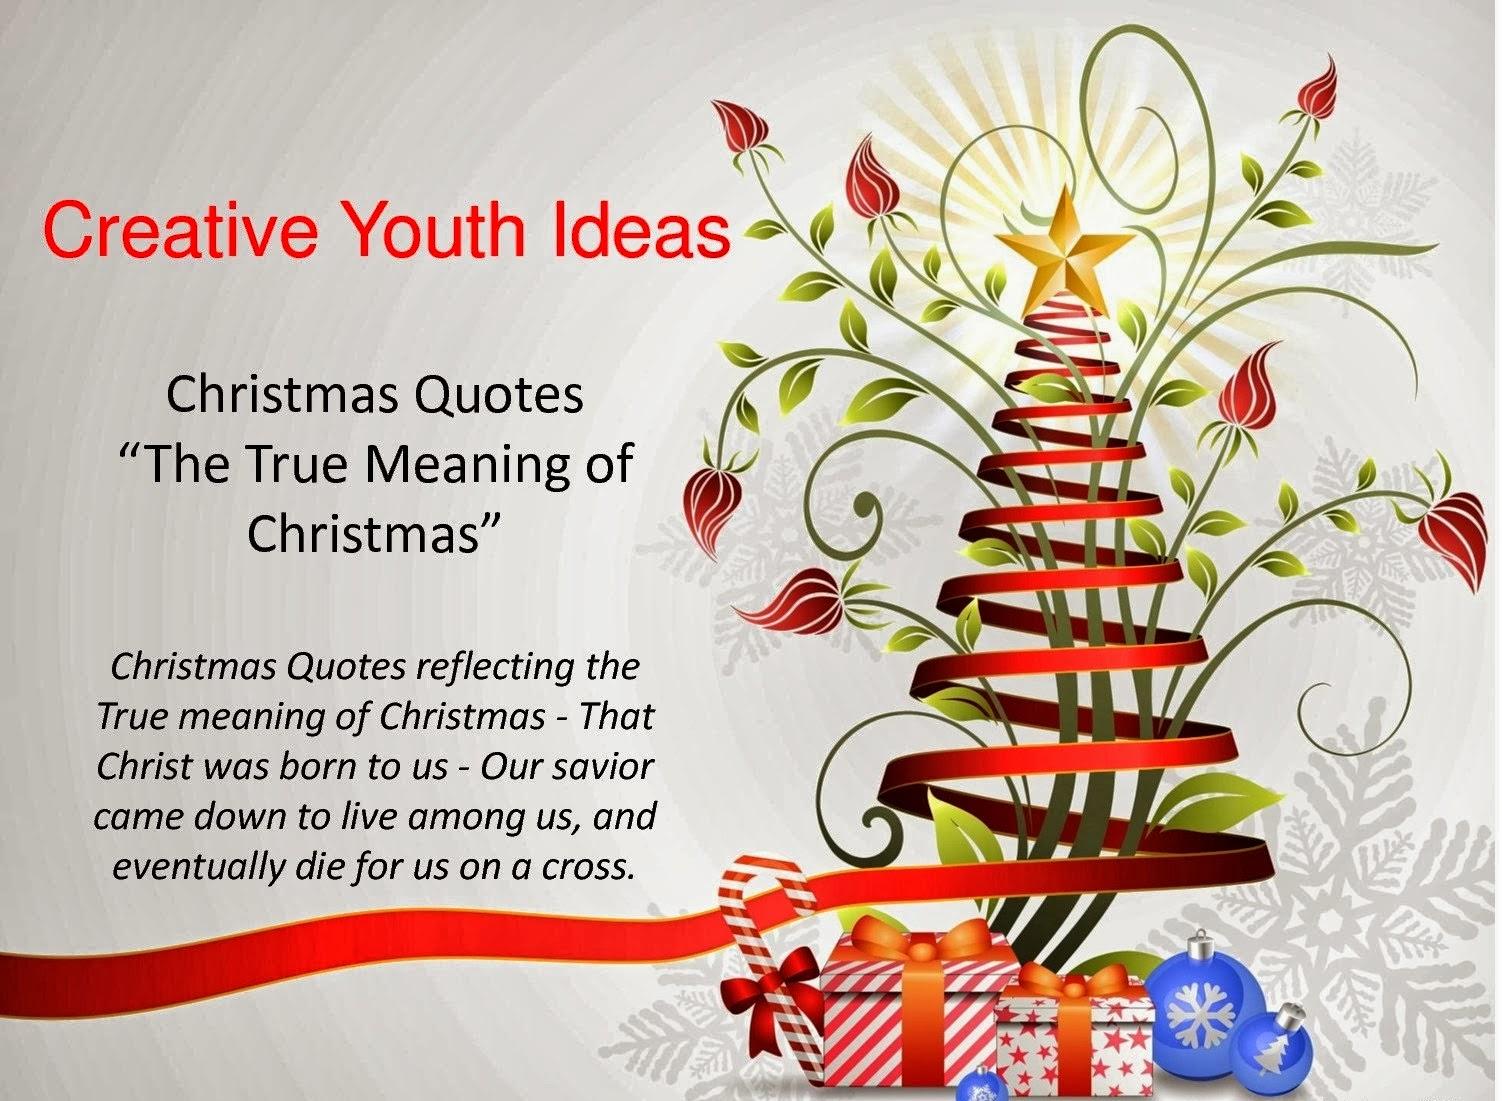 merry christmas baby christmas songs lyrics - Merry Merry Merry Christmas Lyrics